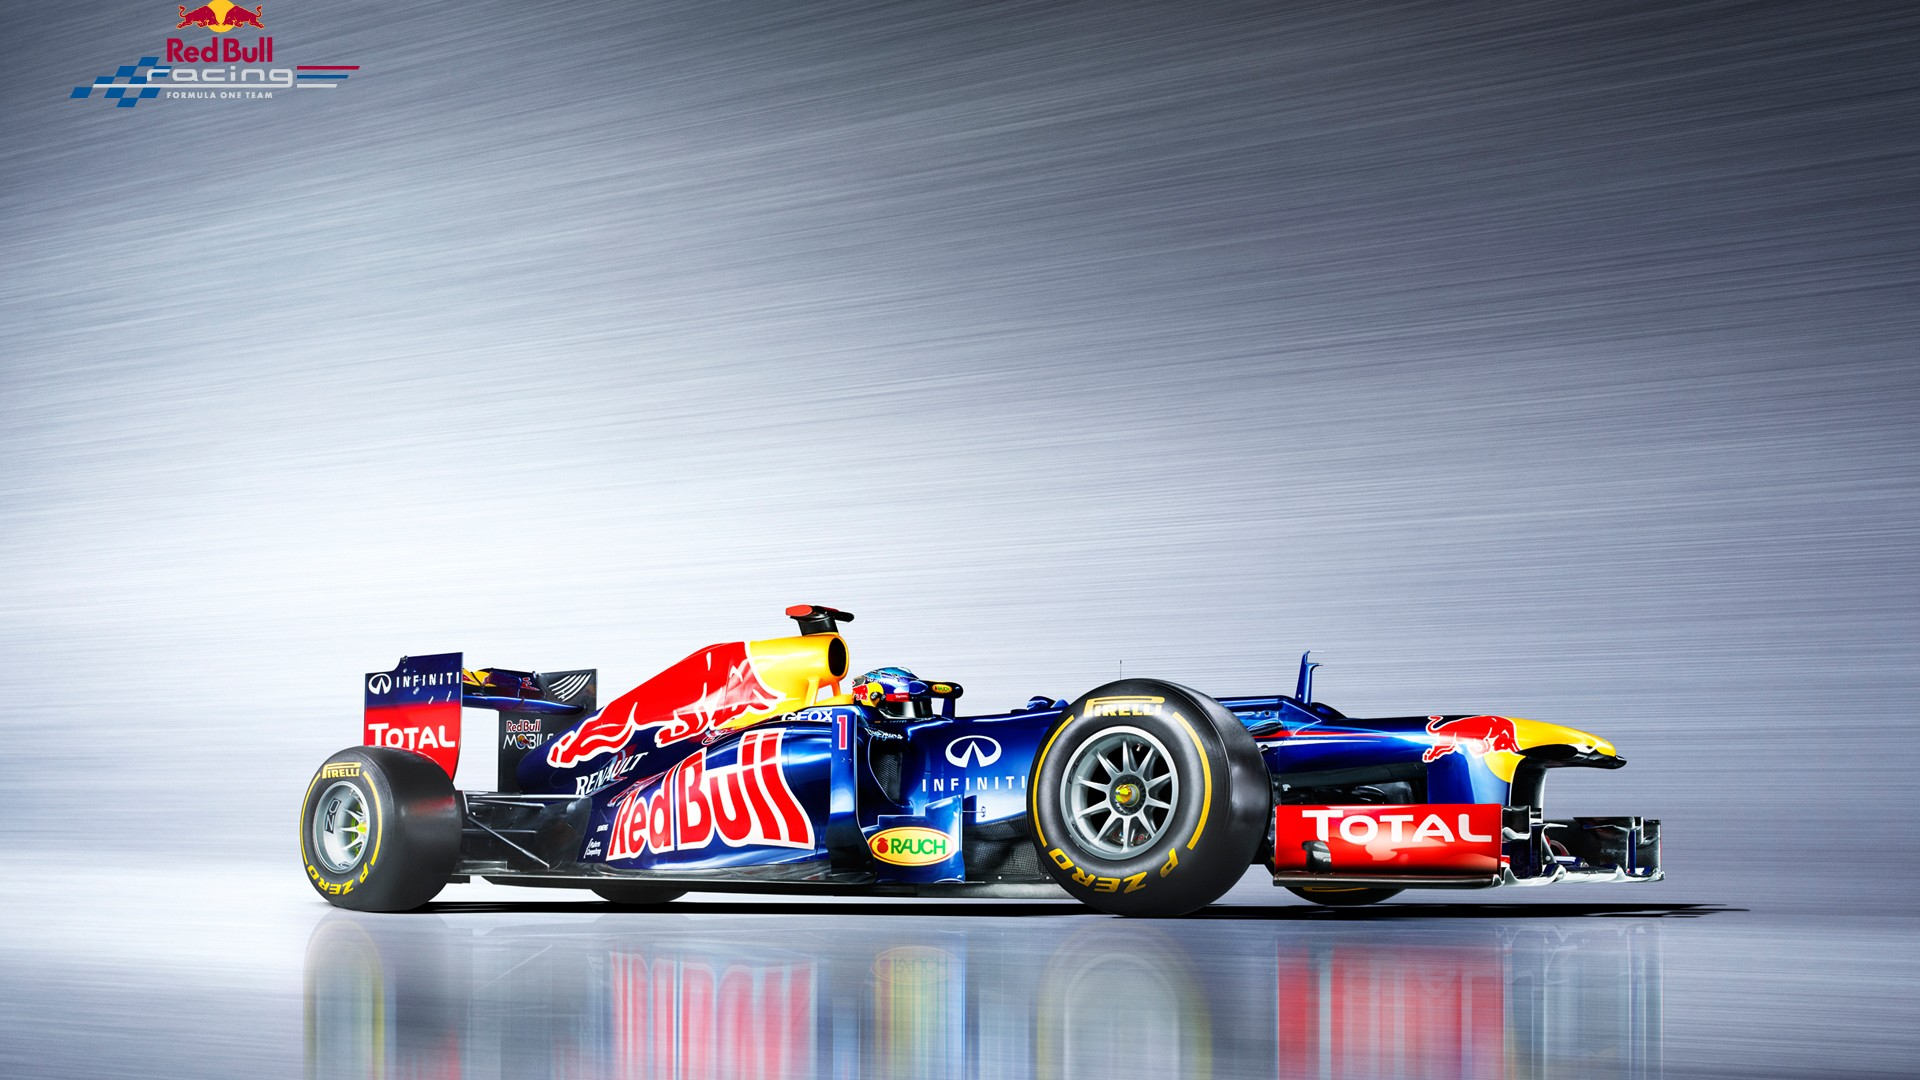 Formula 1 Hd Wallpapers - 1920x1080 ...